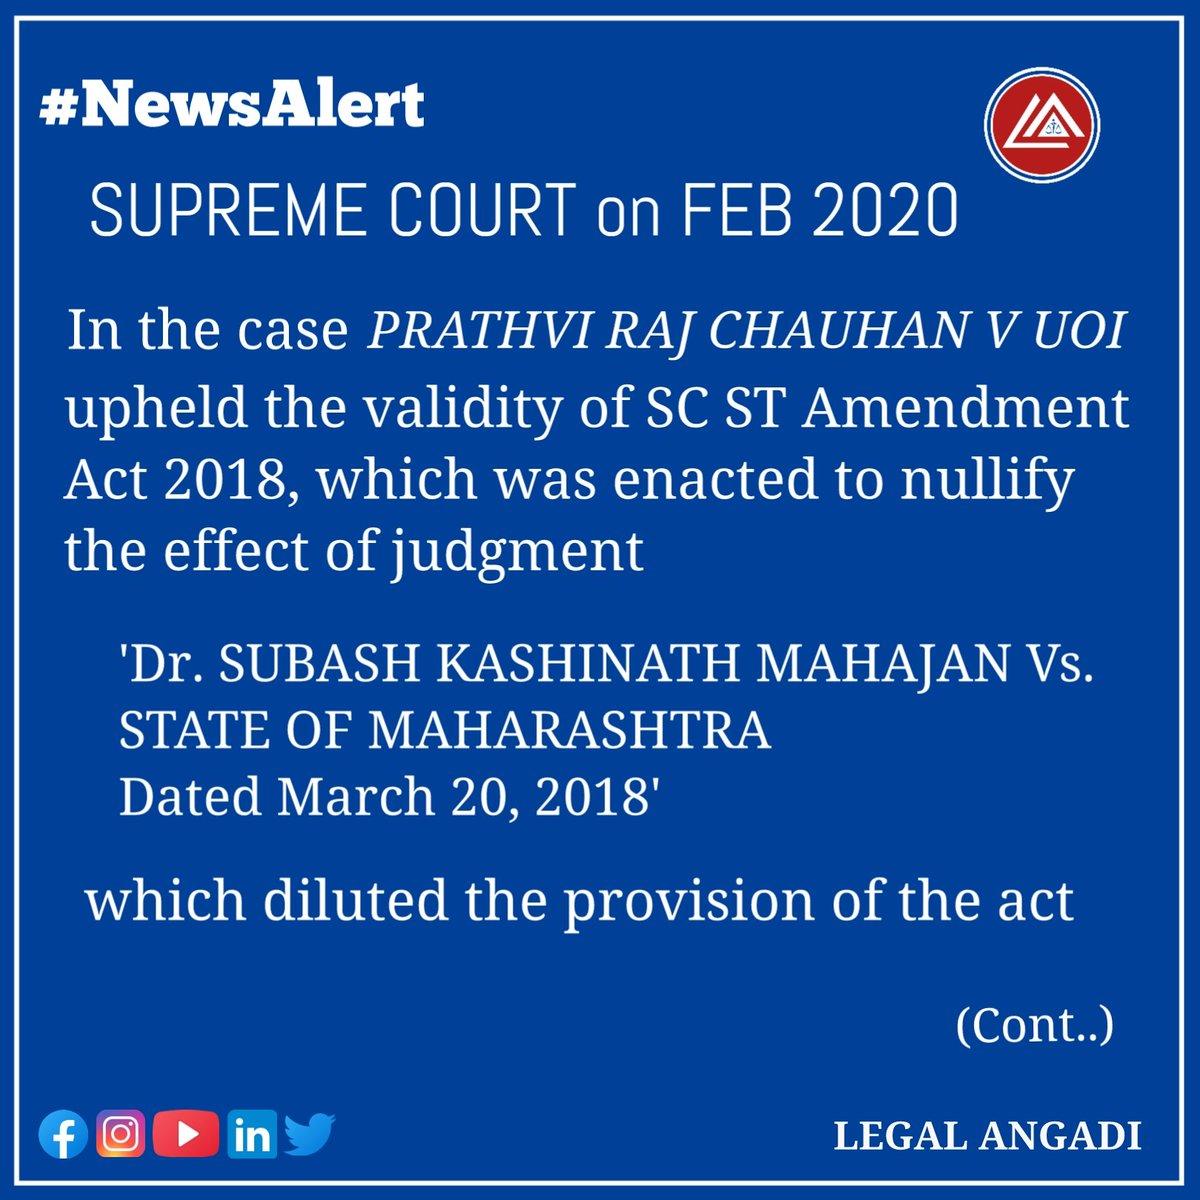 Short read on SC ST AMENDMENT ACT 2018  Follow us for more Legal Updates   #law #legal #legalangadi #lawfirm #chennai #india #legalprofession #awareness #legaladvice #lawyer #legalupdates #legaleducation #courts #supremecourt #litigation #currentaffairs  #scstact #amendmentspic.twitter.com/e1rI2k5H5c